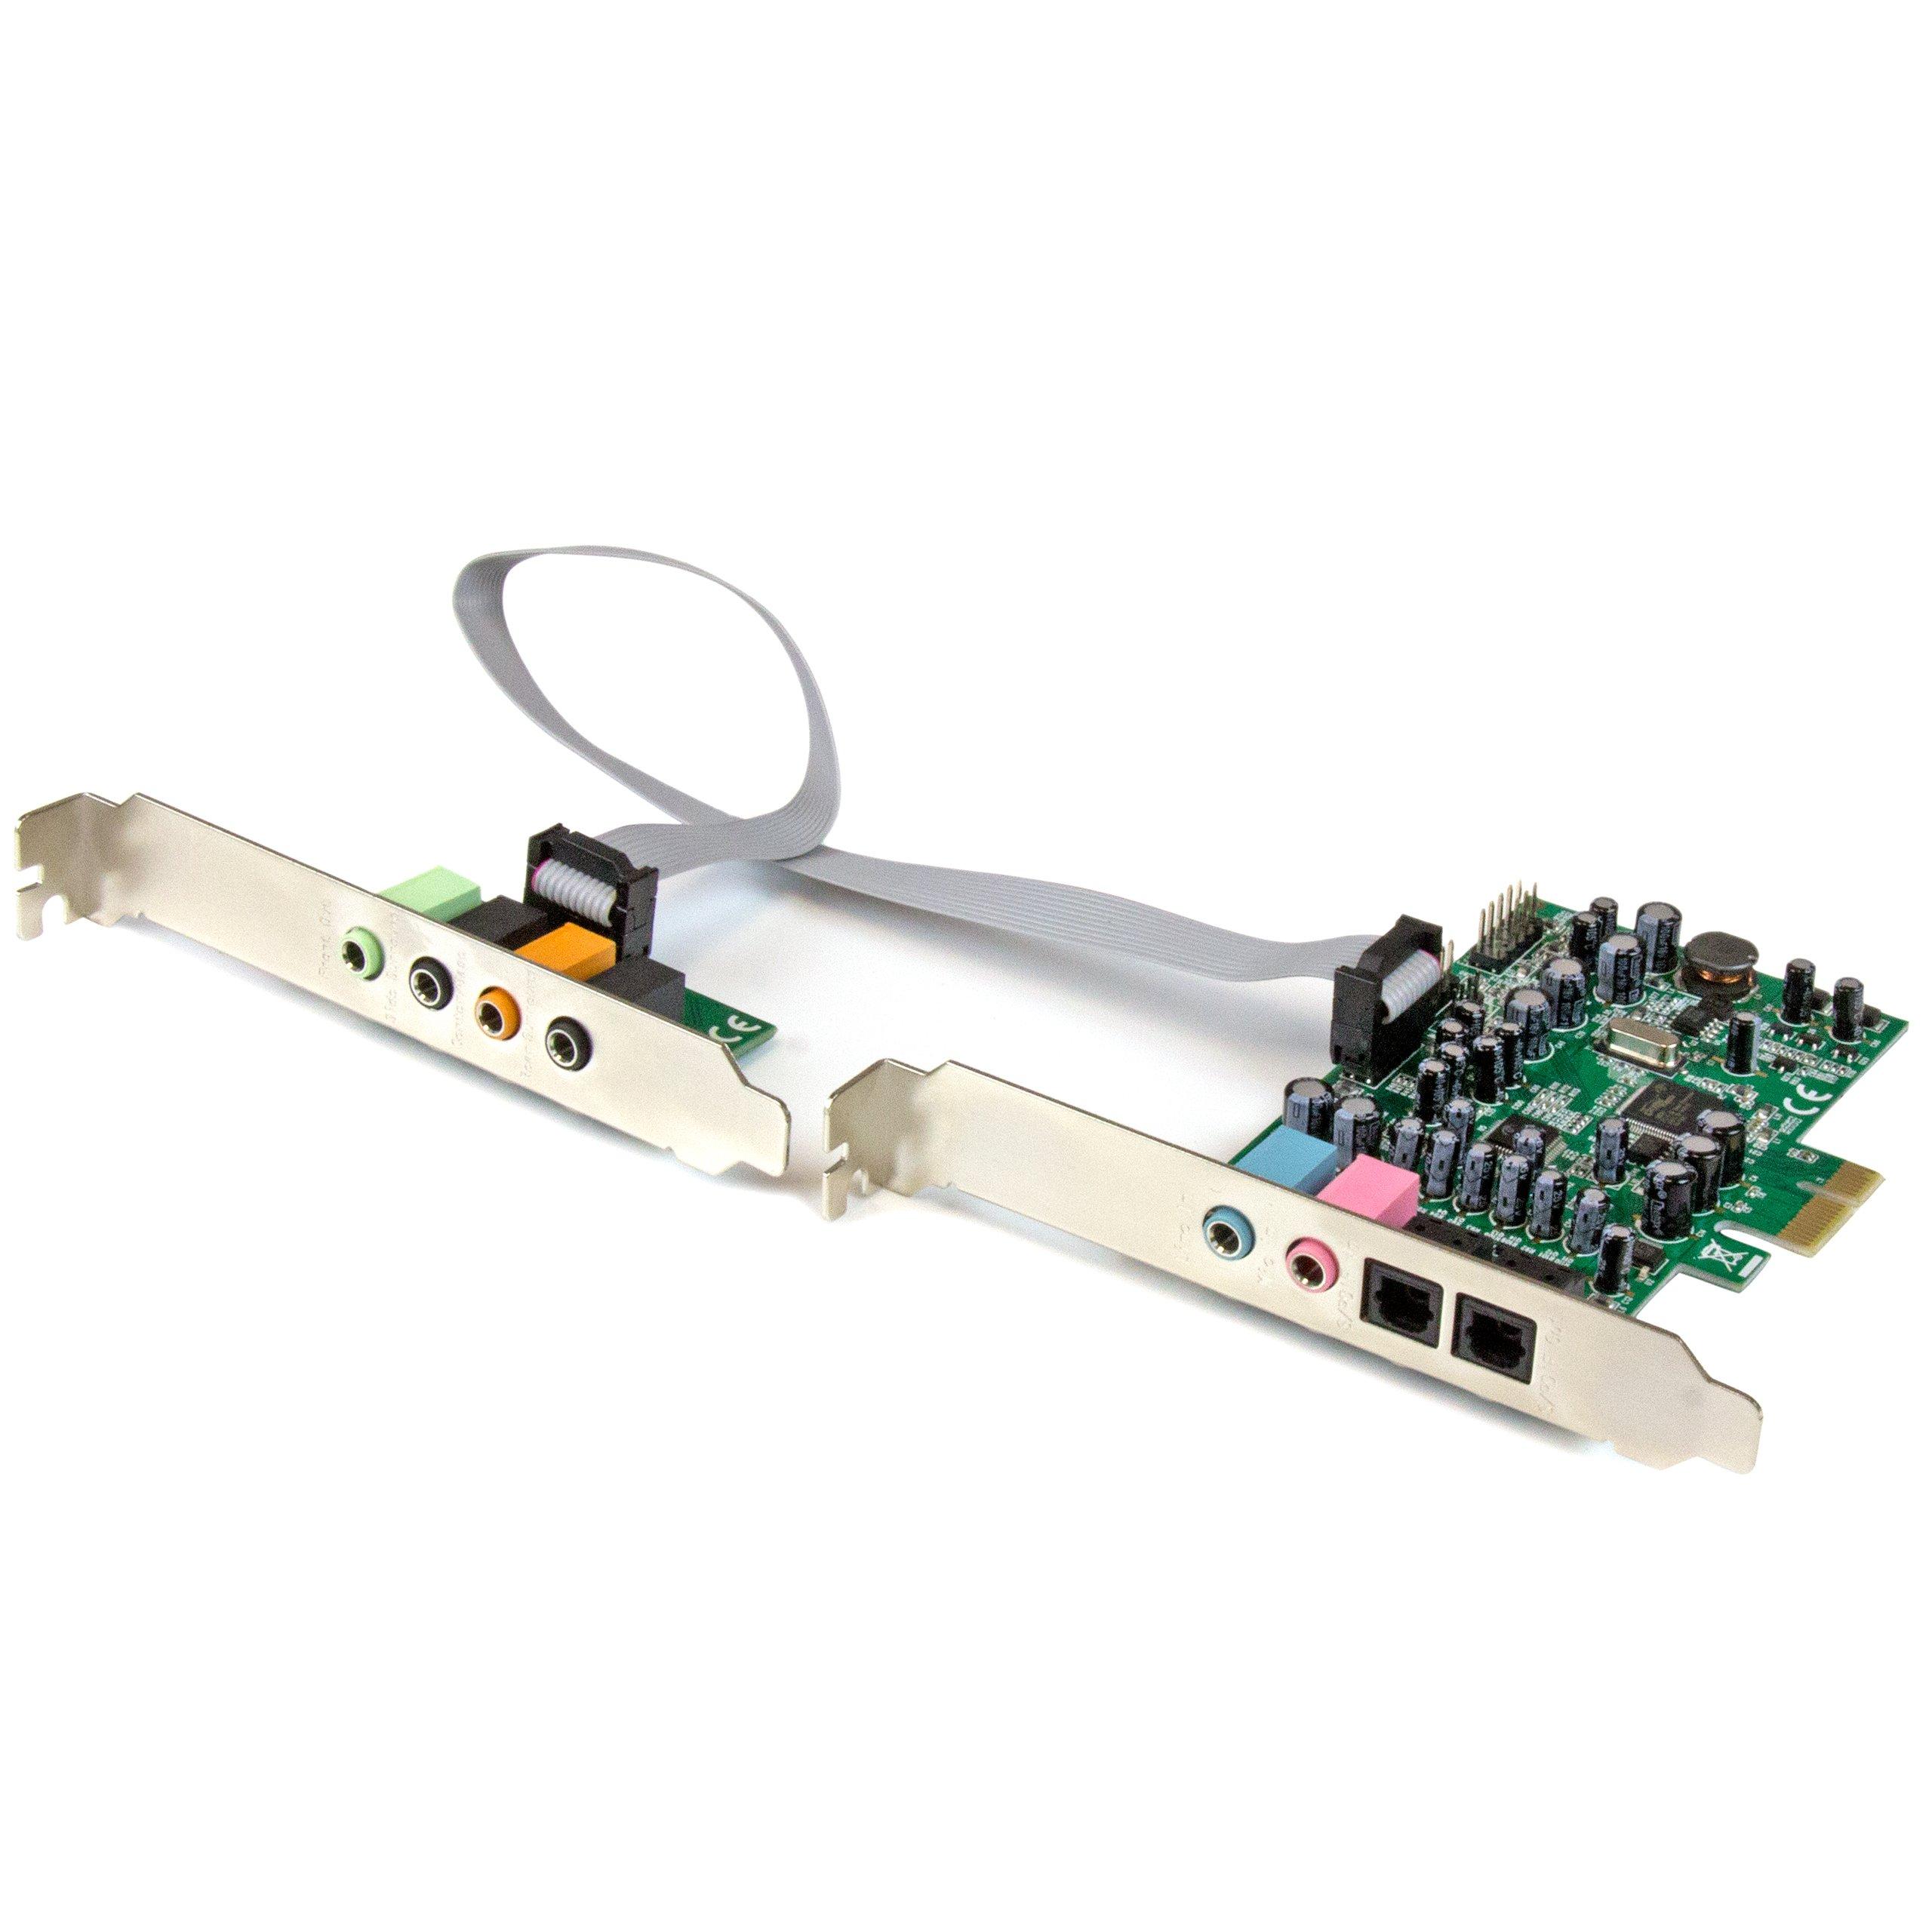 StarTech.com 7.1 Channel Sound Card - PCI Express - 24-bit - 192KHz - SPDIF Digital Optical and 3.5mm Analog Audio (PEXSOUND7CH)